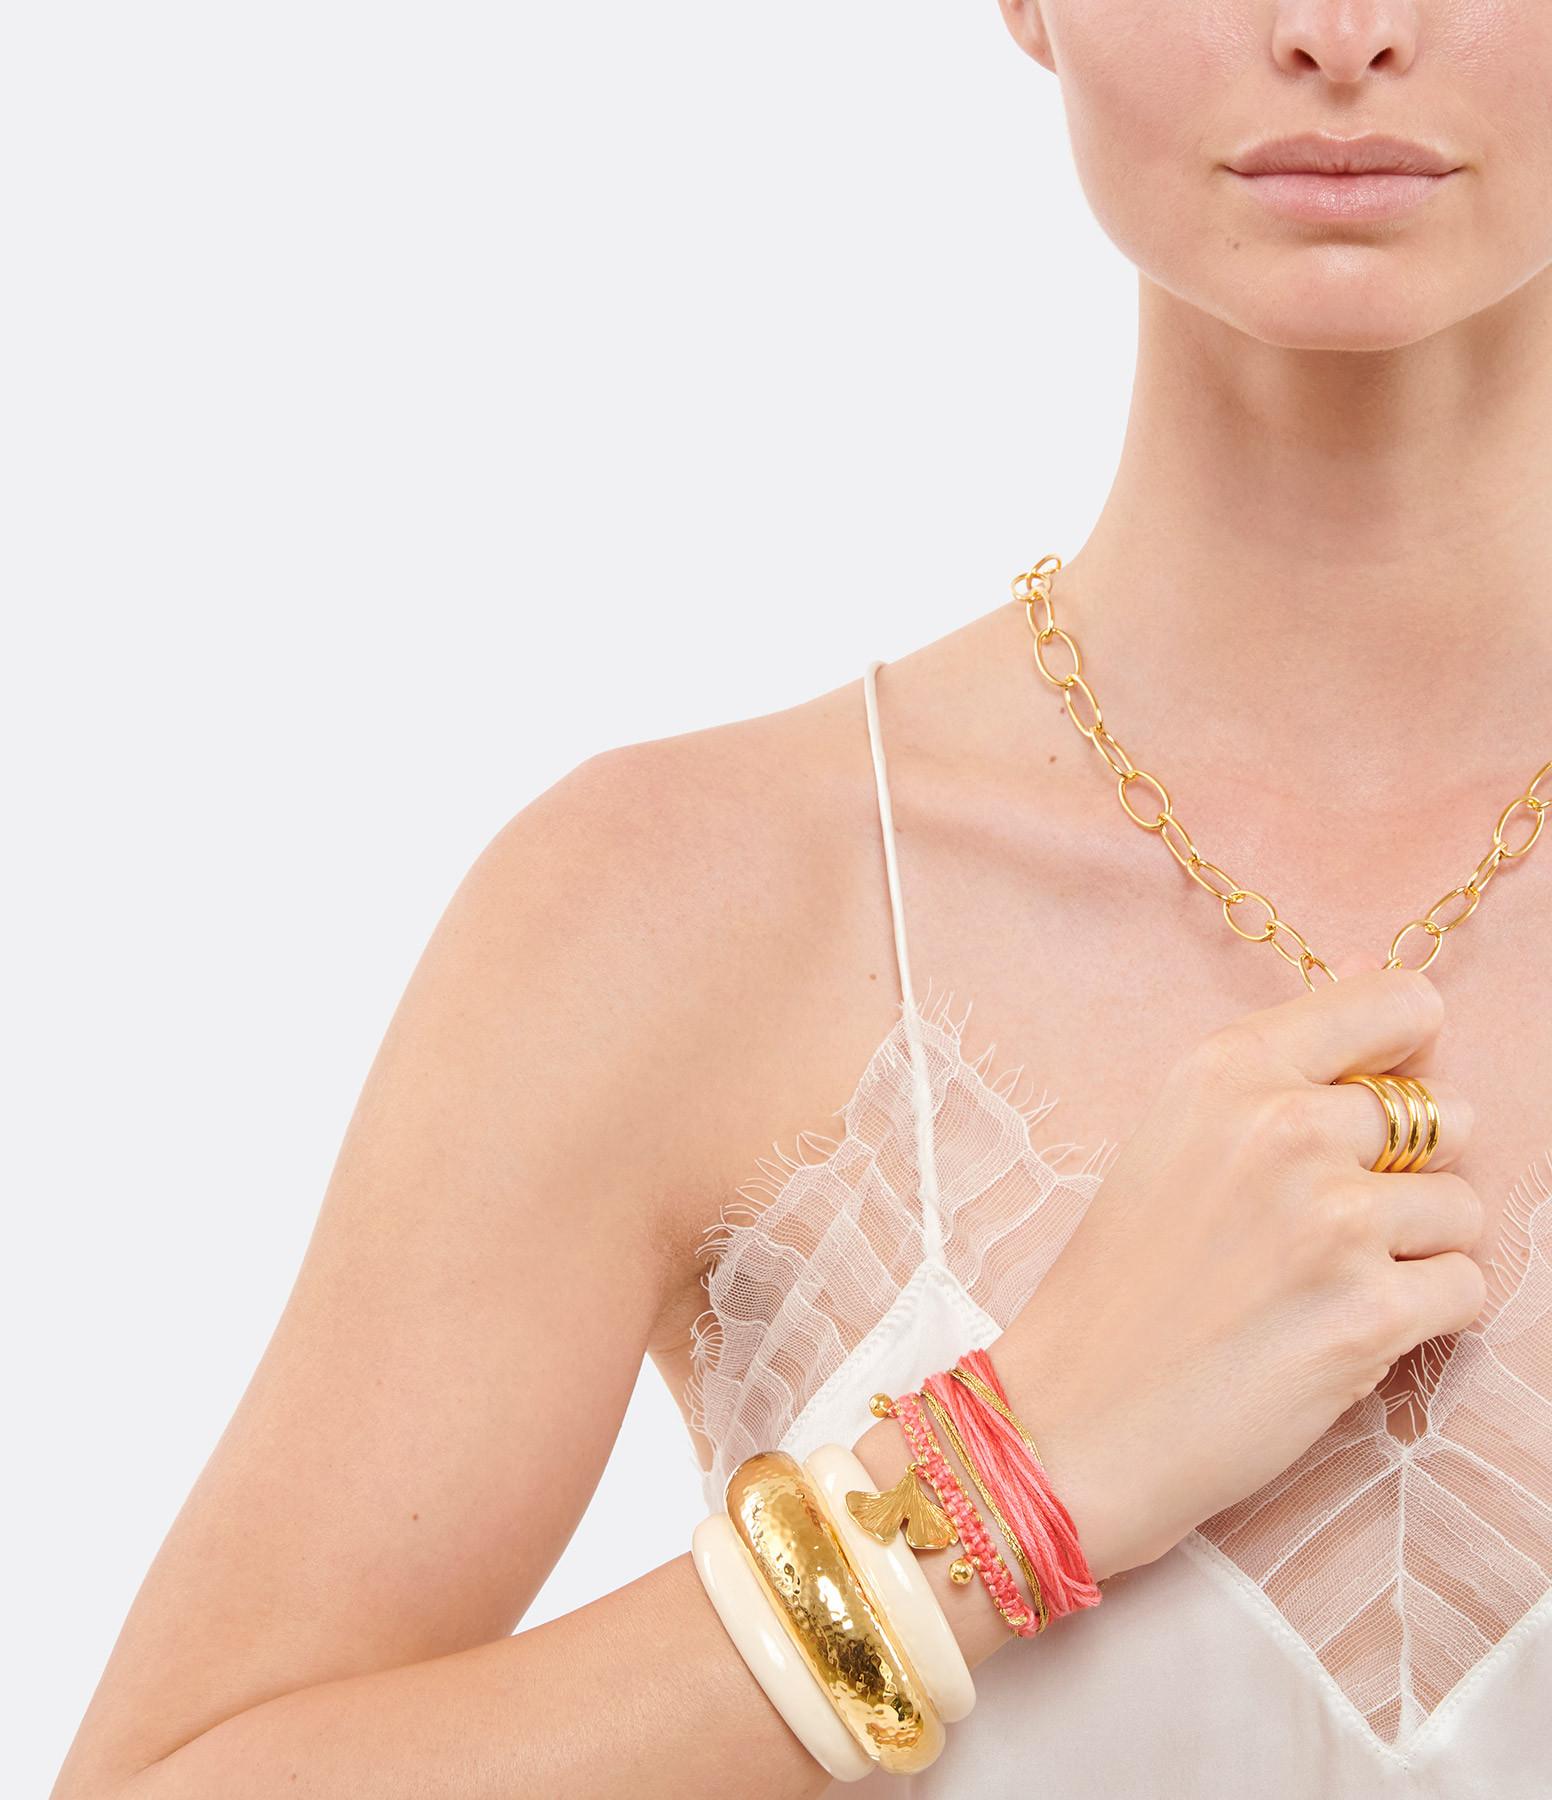 AURELIE BIDERMANN - Bracelet Honolulu Charm Ginkgo Rose Plaqué Or